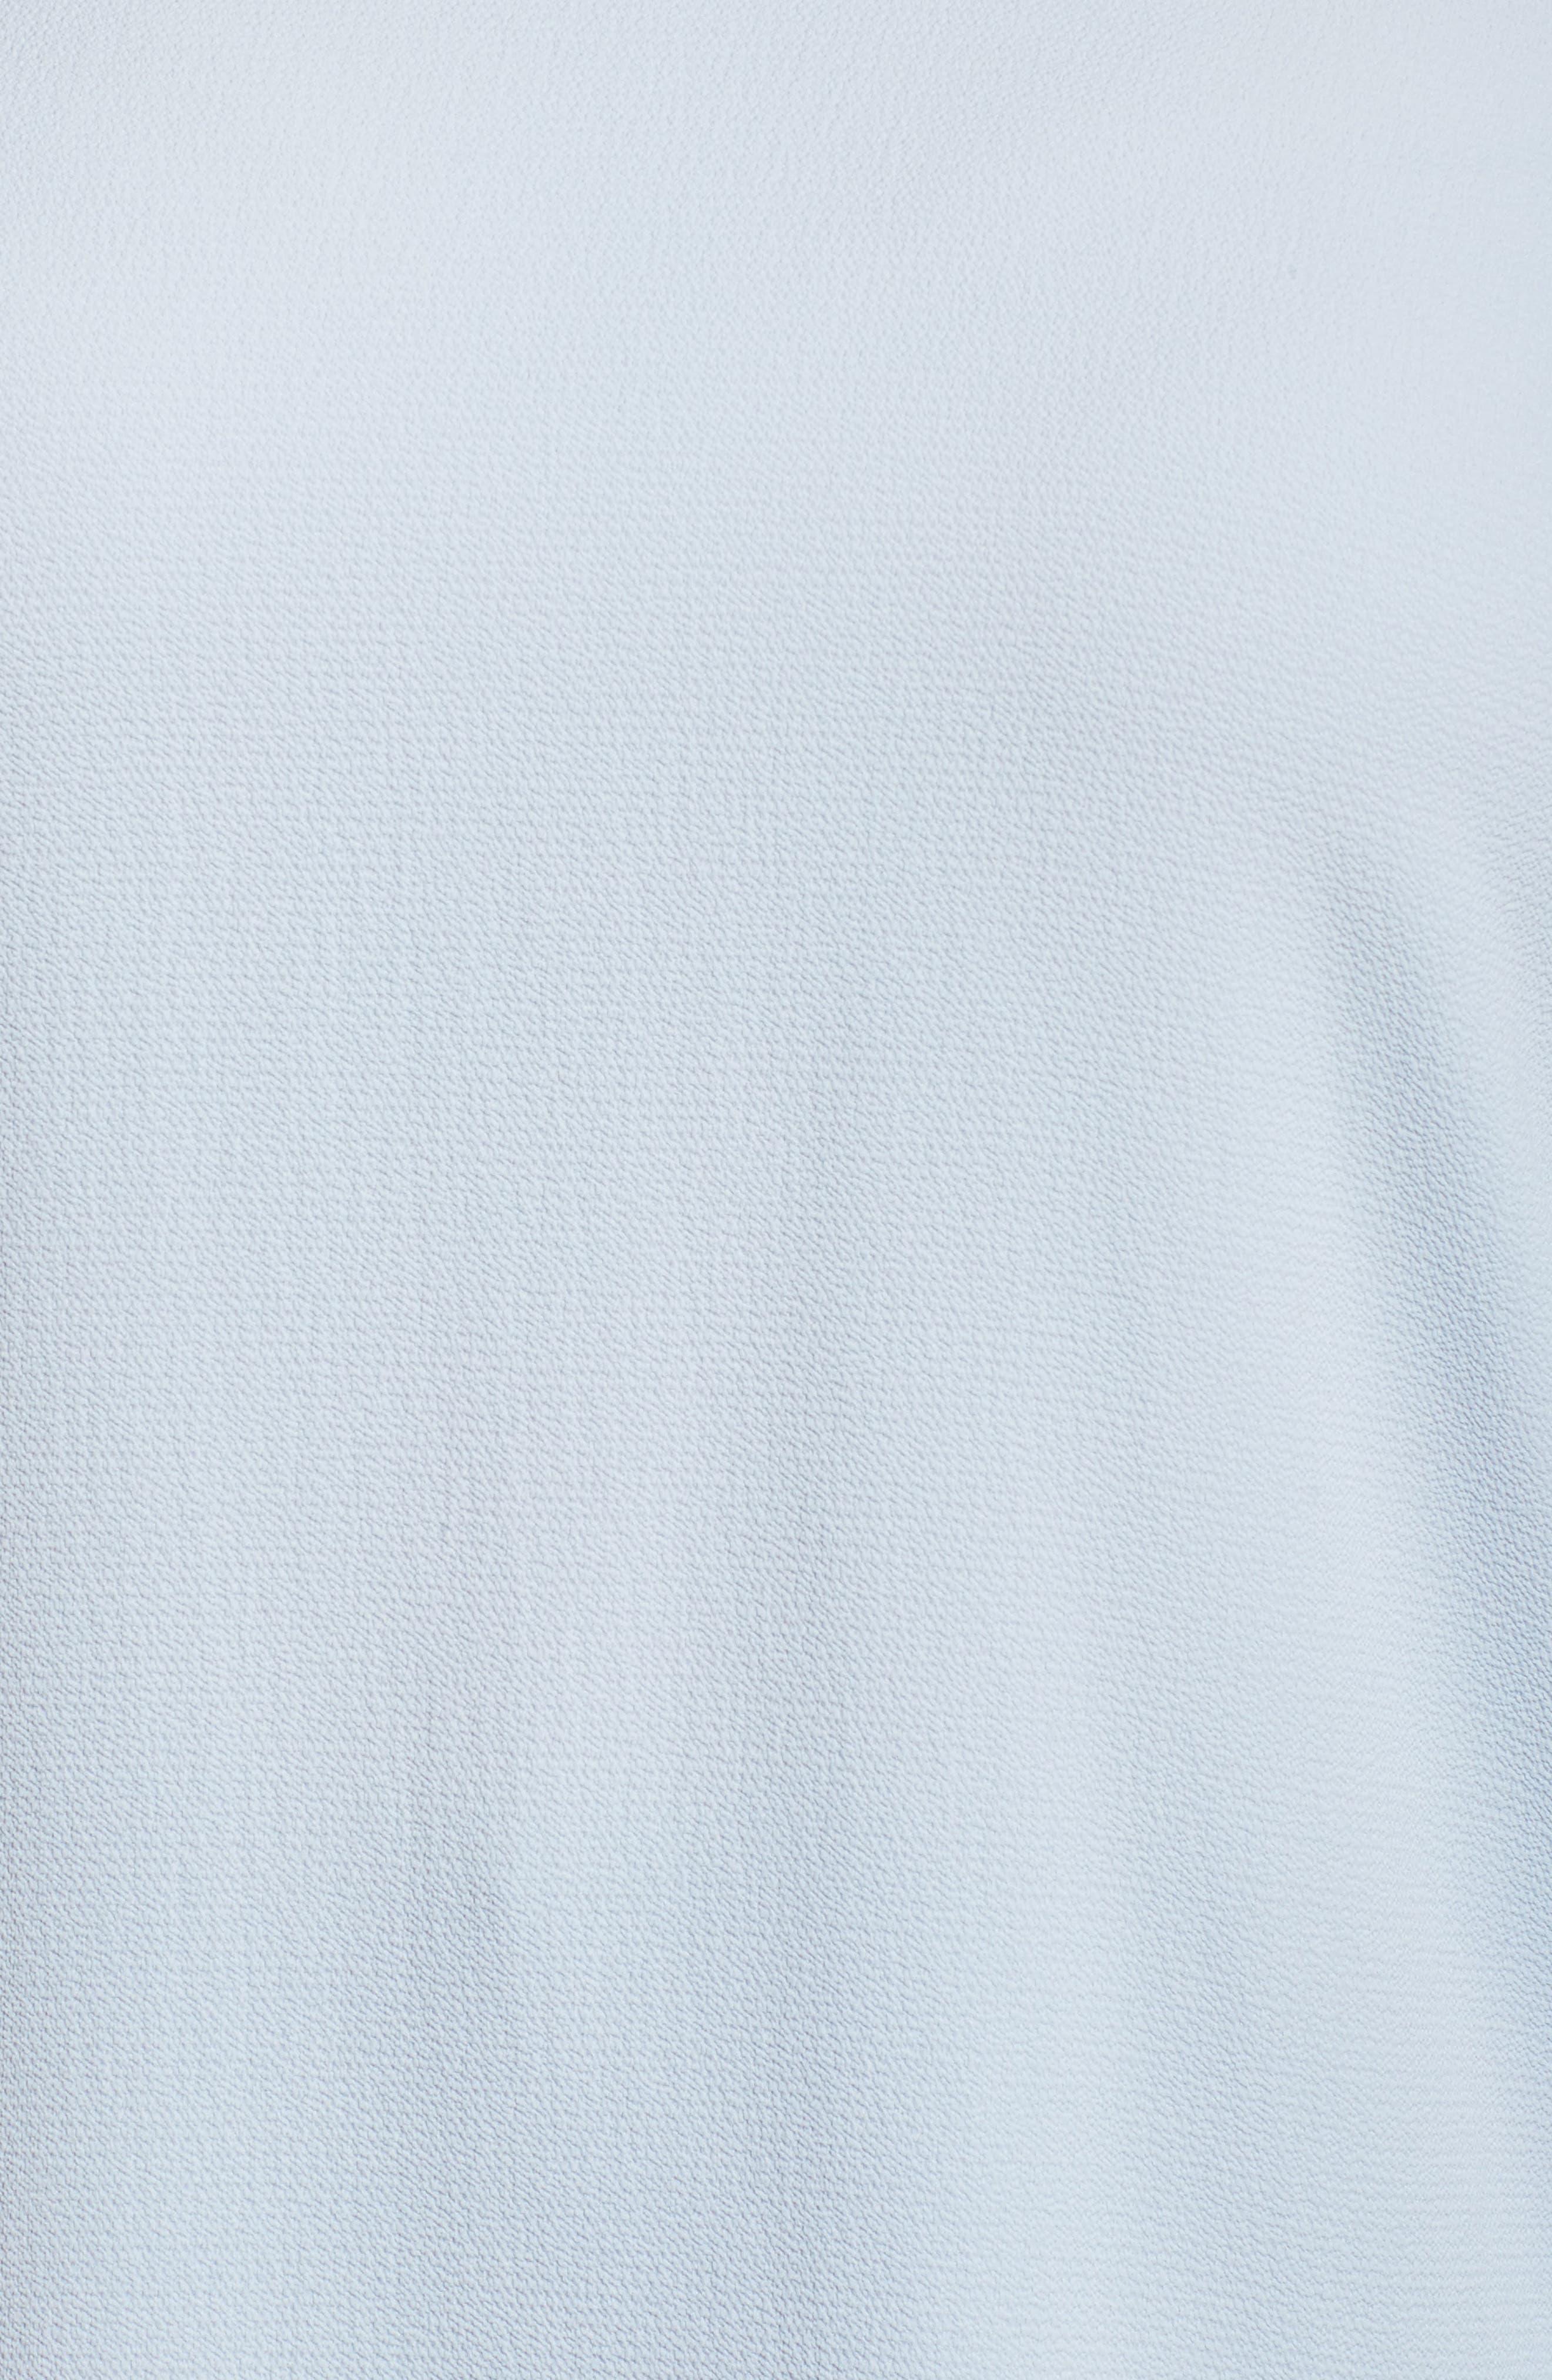 Bell Sleeve Blouse,                             Alternate thumbnail 5, color,                             431